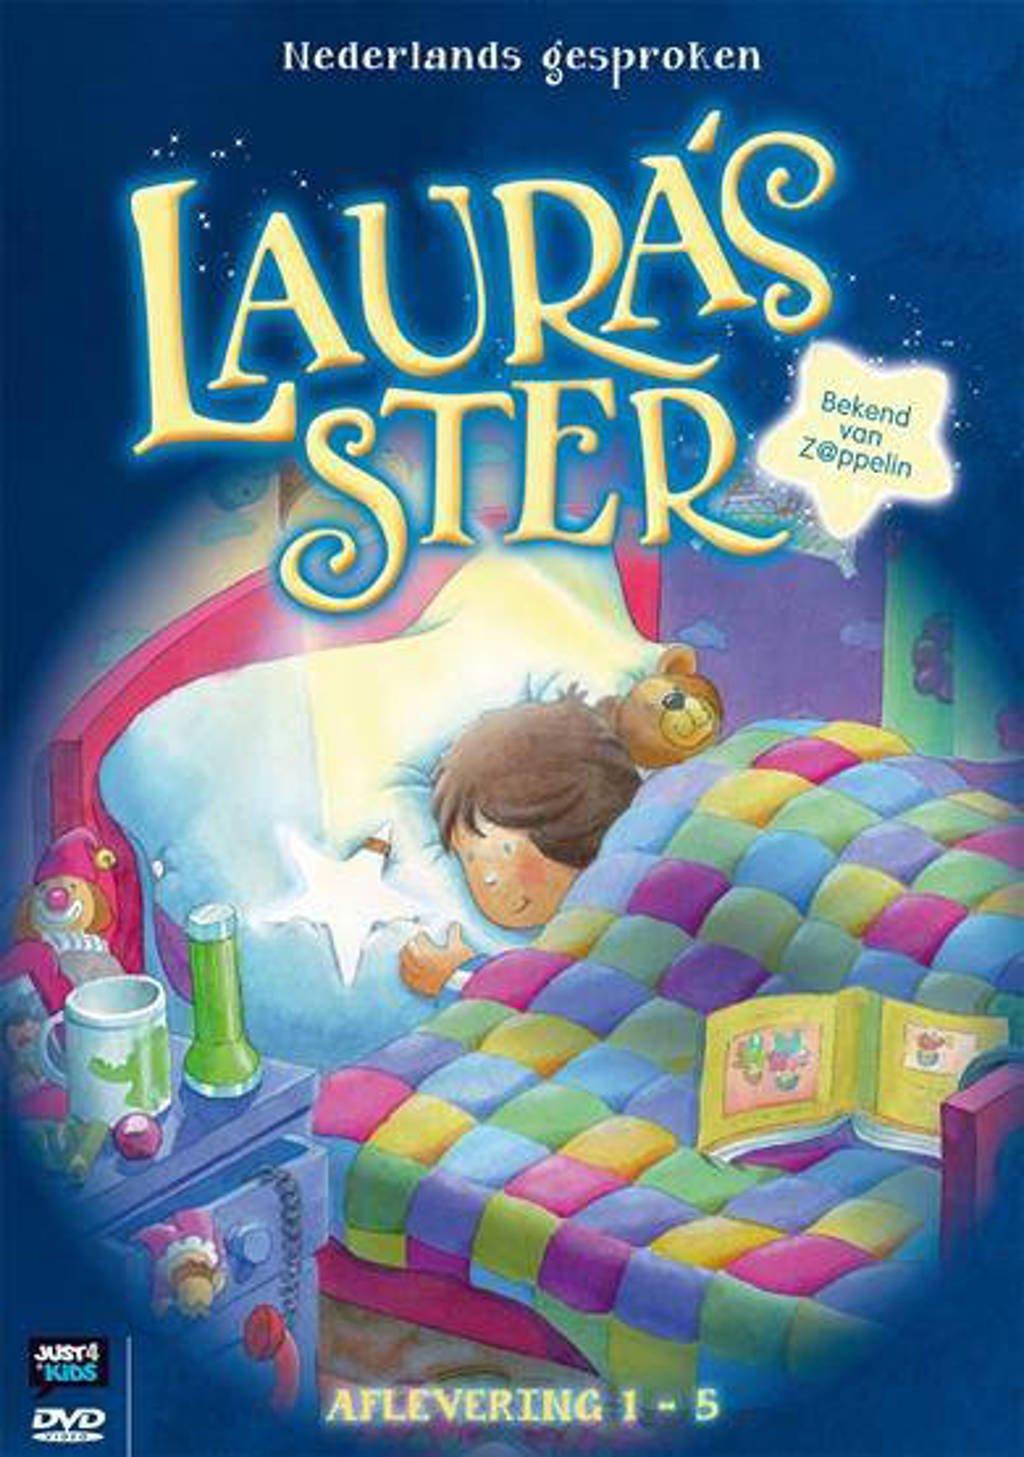 Laura's ster afl. 1-5 (DVD)